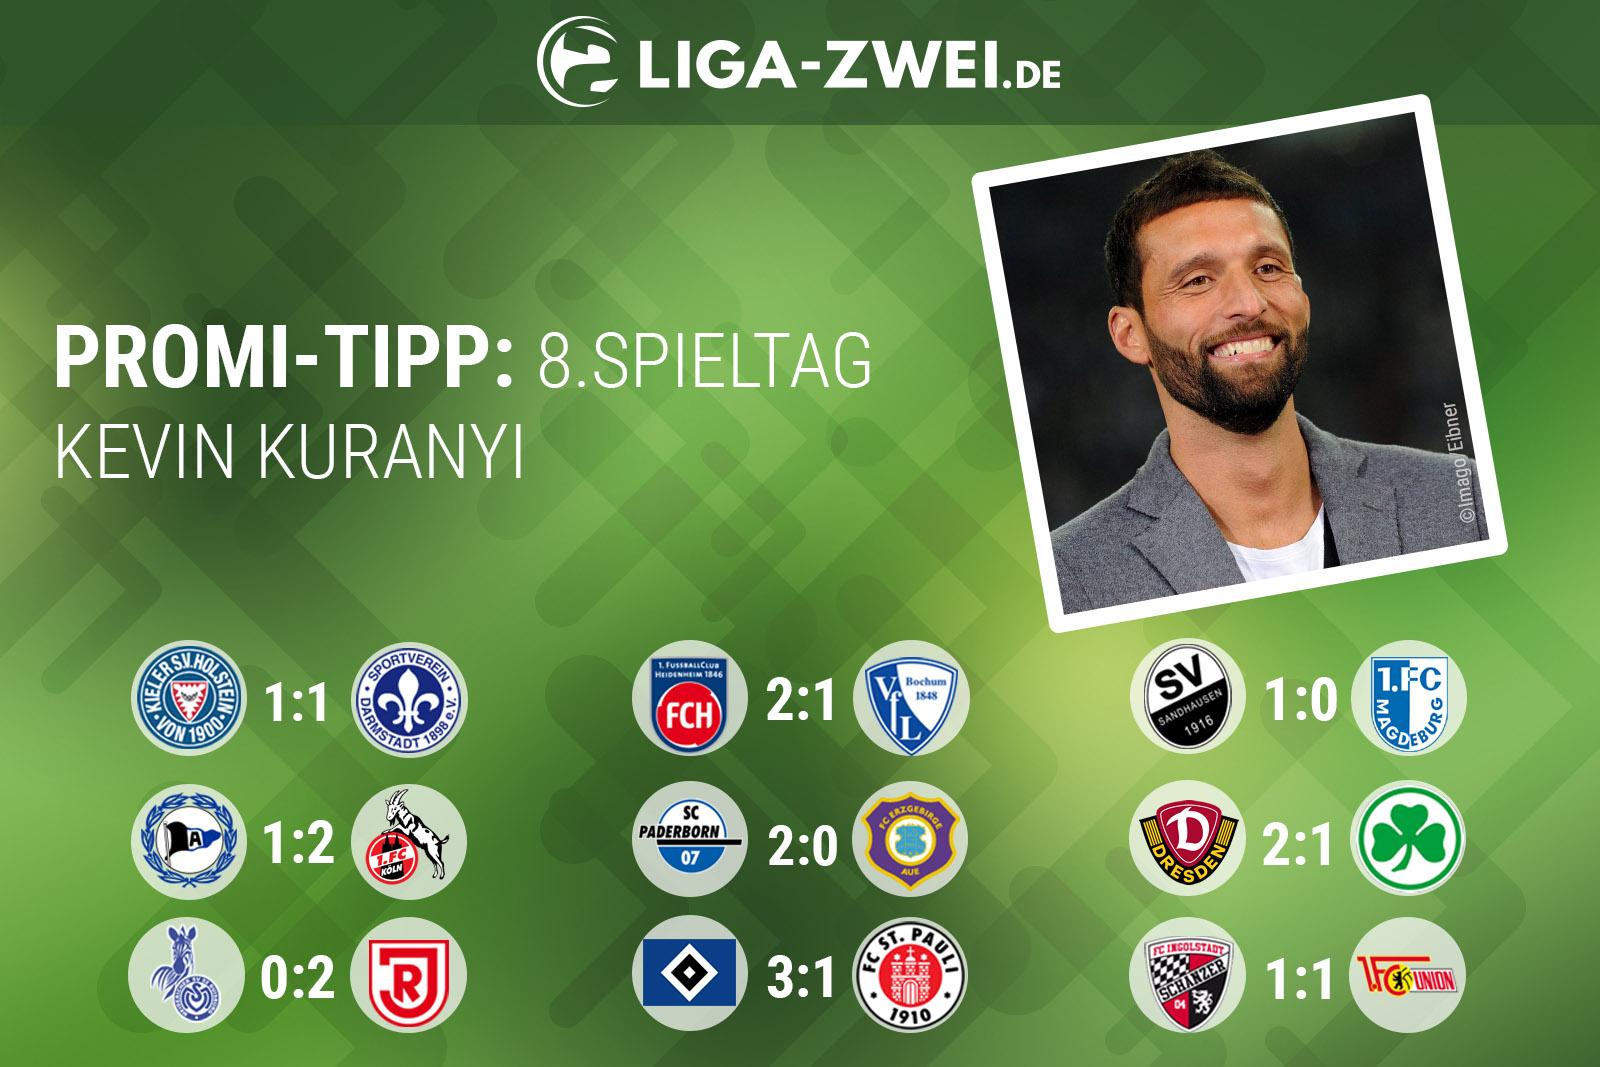 Kevin Kuranyi beim Liga-Zwei.de Promi-Tipp